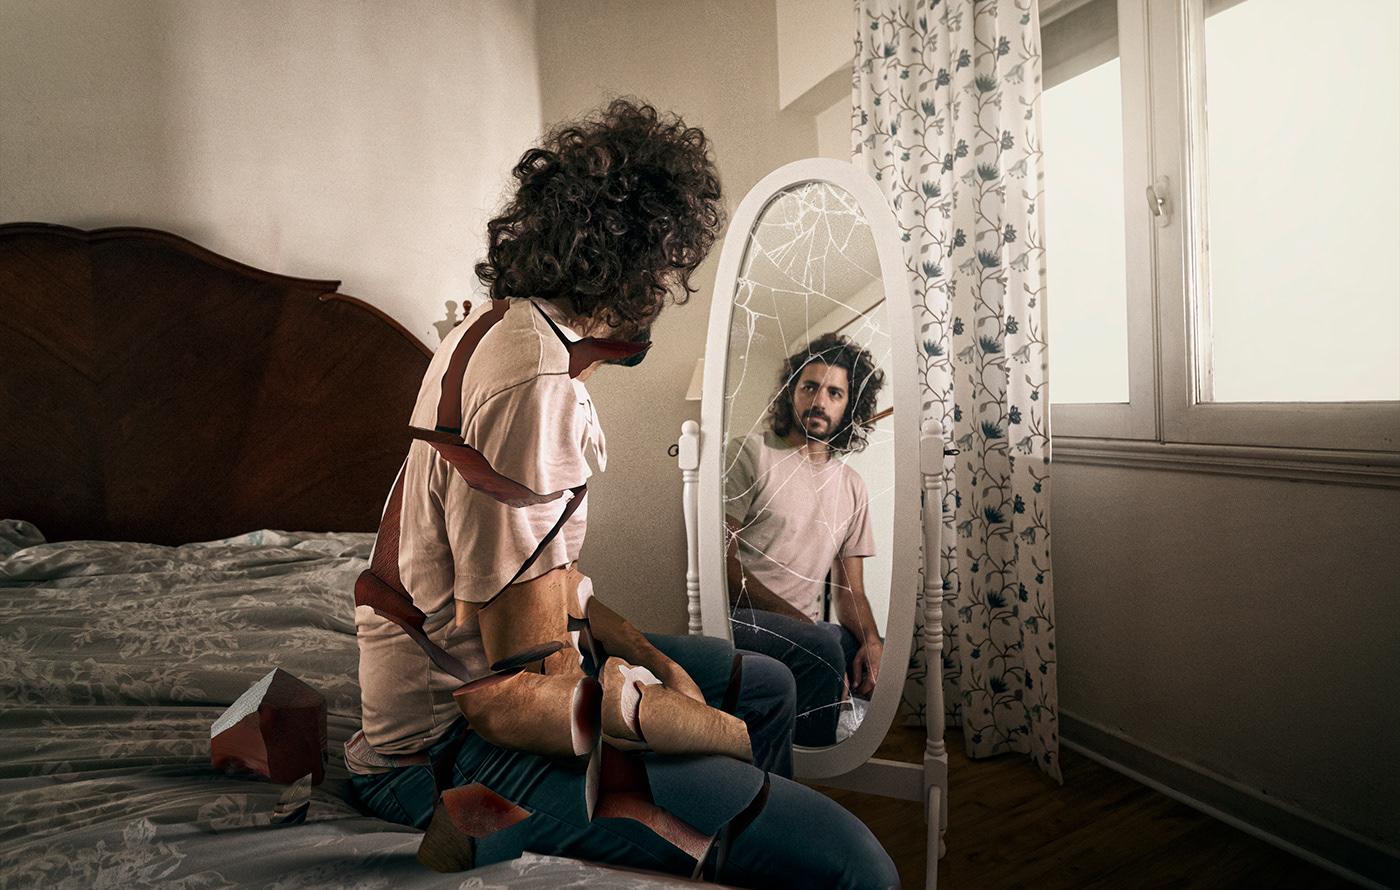 argentina cinema4d compositing Digital Art  martindepasquale nft Photography  photoshop retouching  surreal